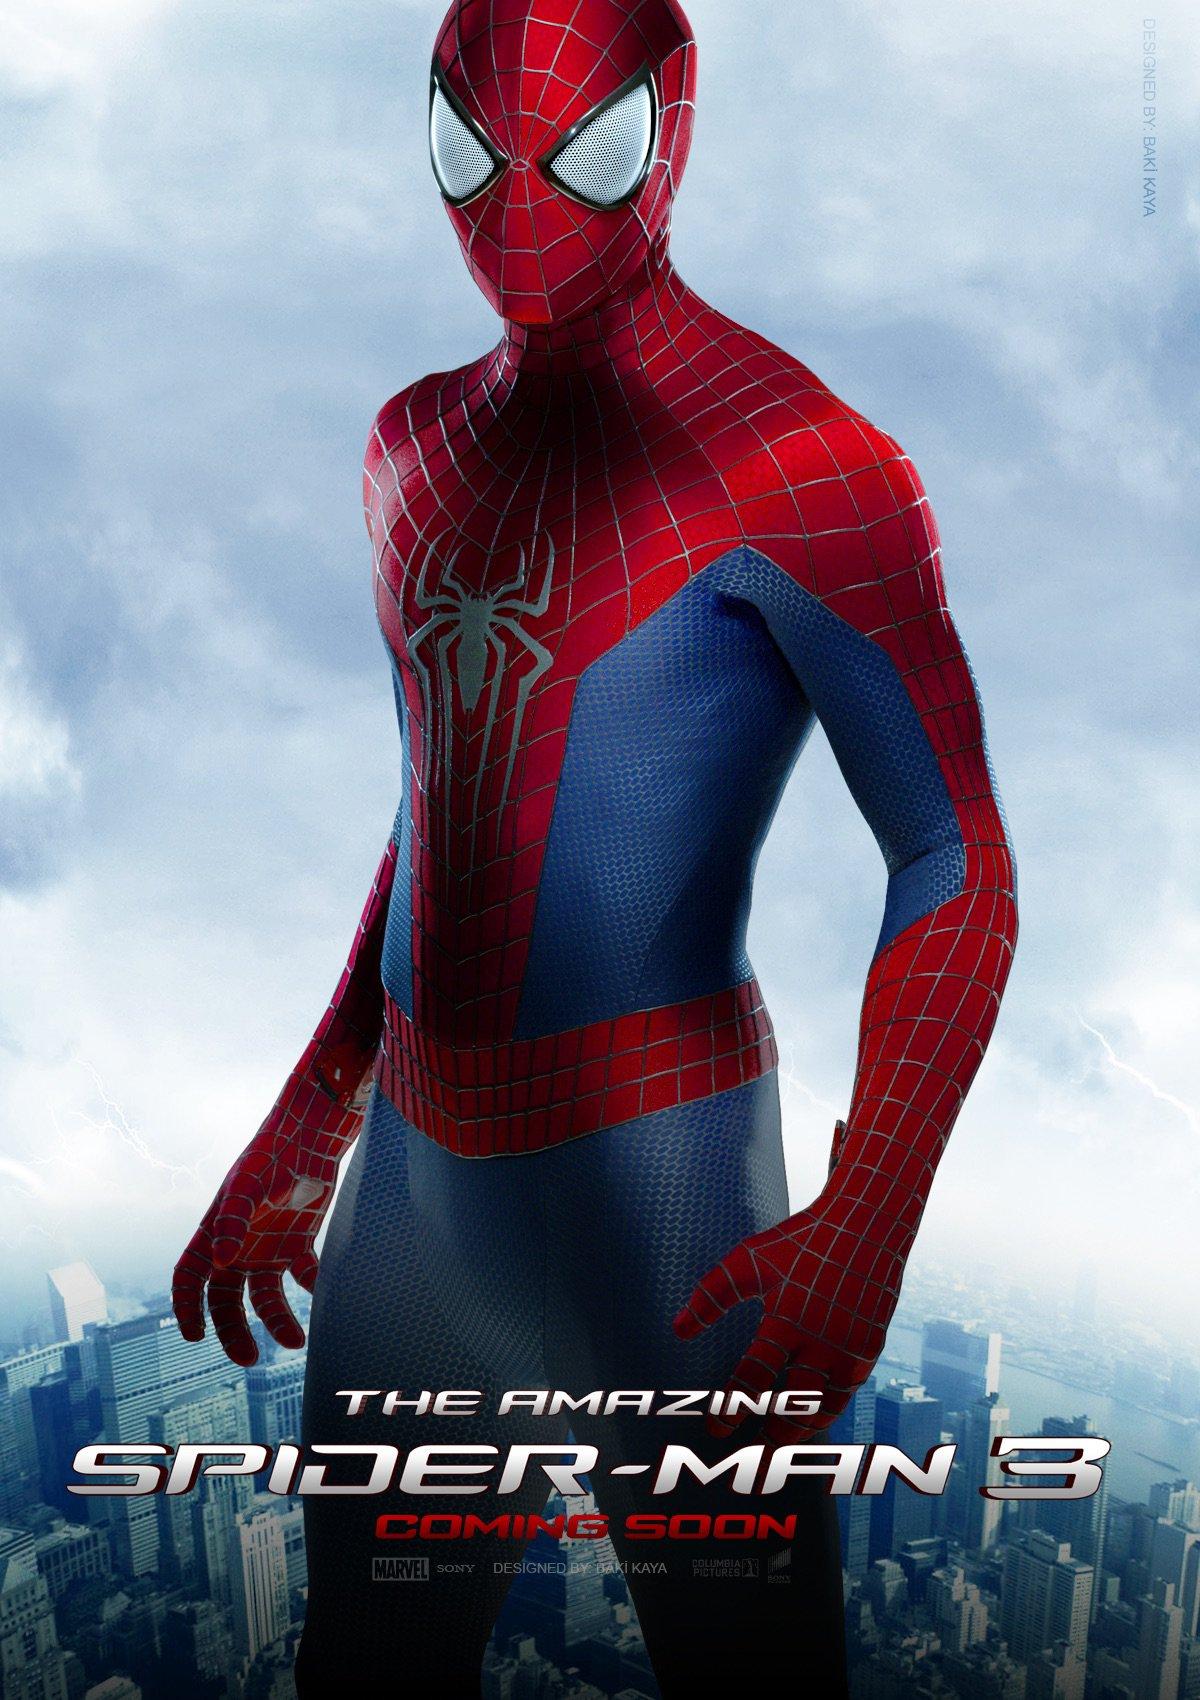 The_Amazing_Spider-Man_3_International_Poster